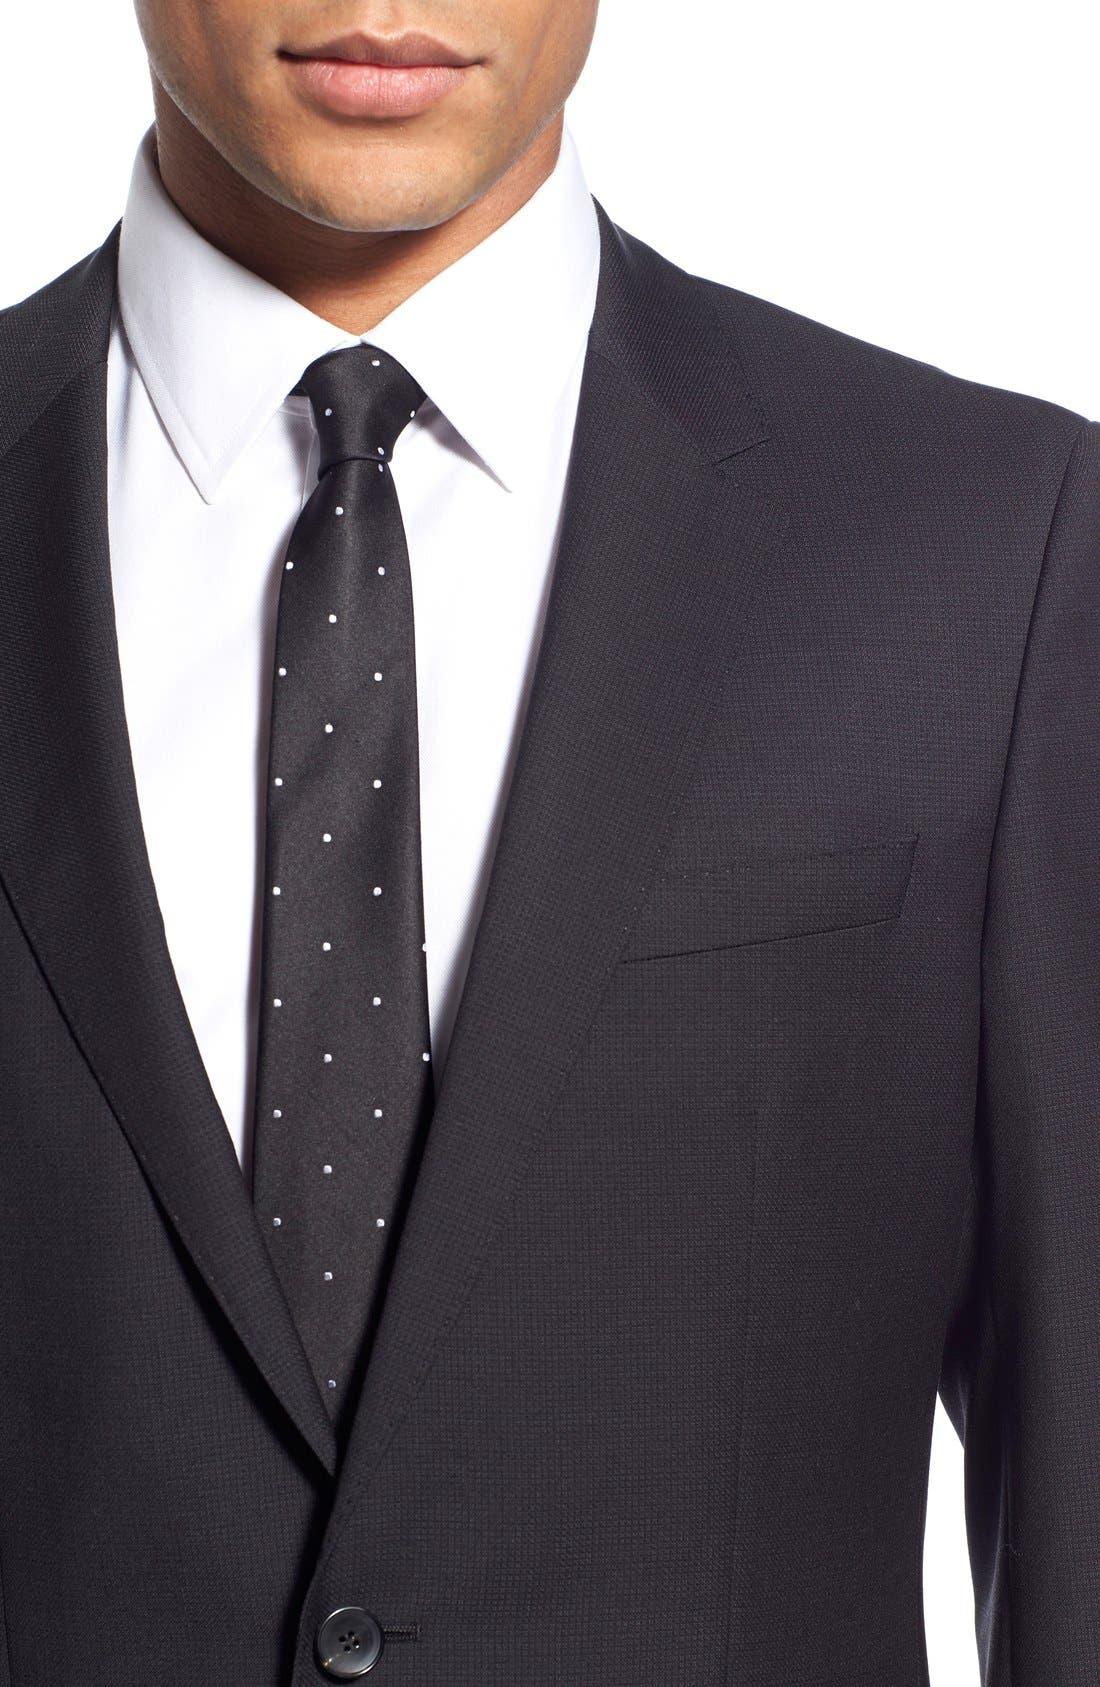 'Huge/Genius' Trim Fit Solid Wool Suit,                             Alternate thumbnail 14, color,                             BLACK